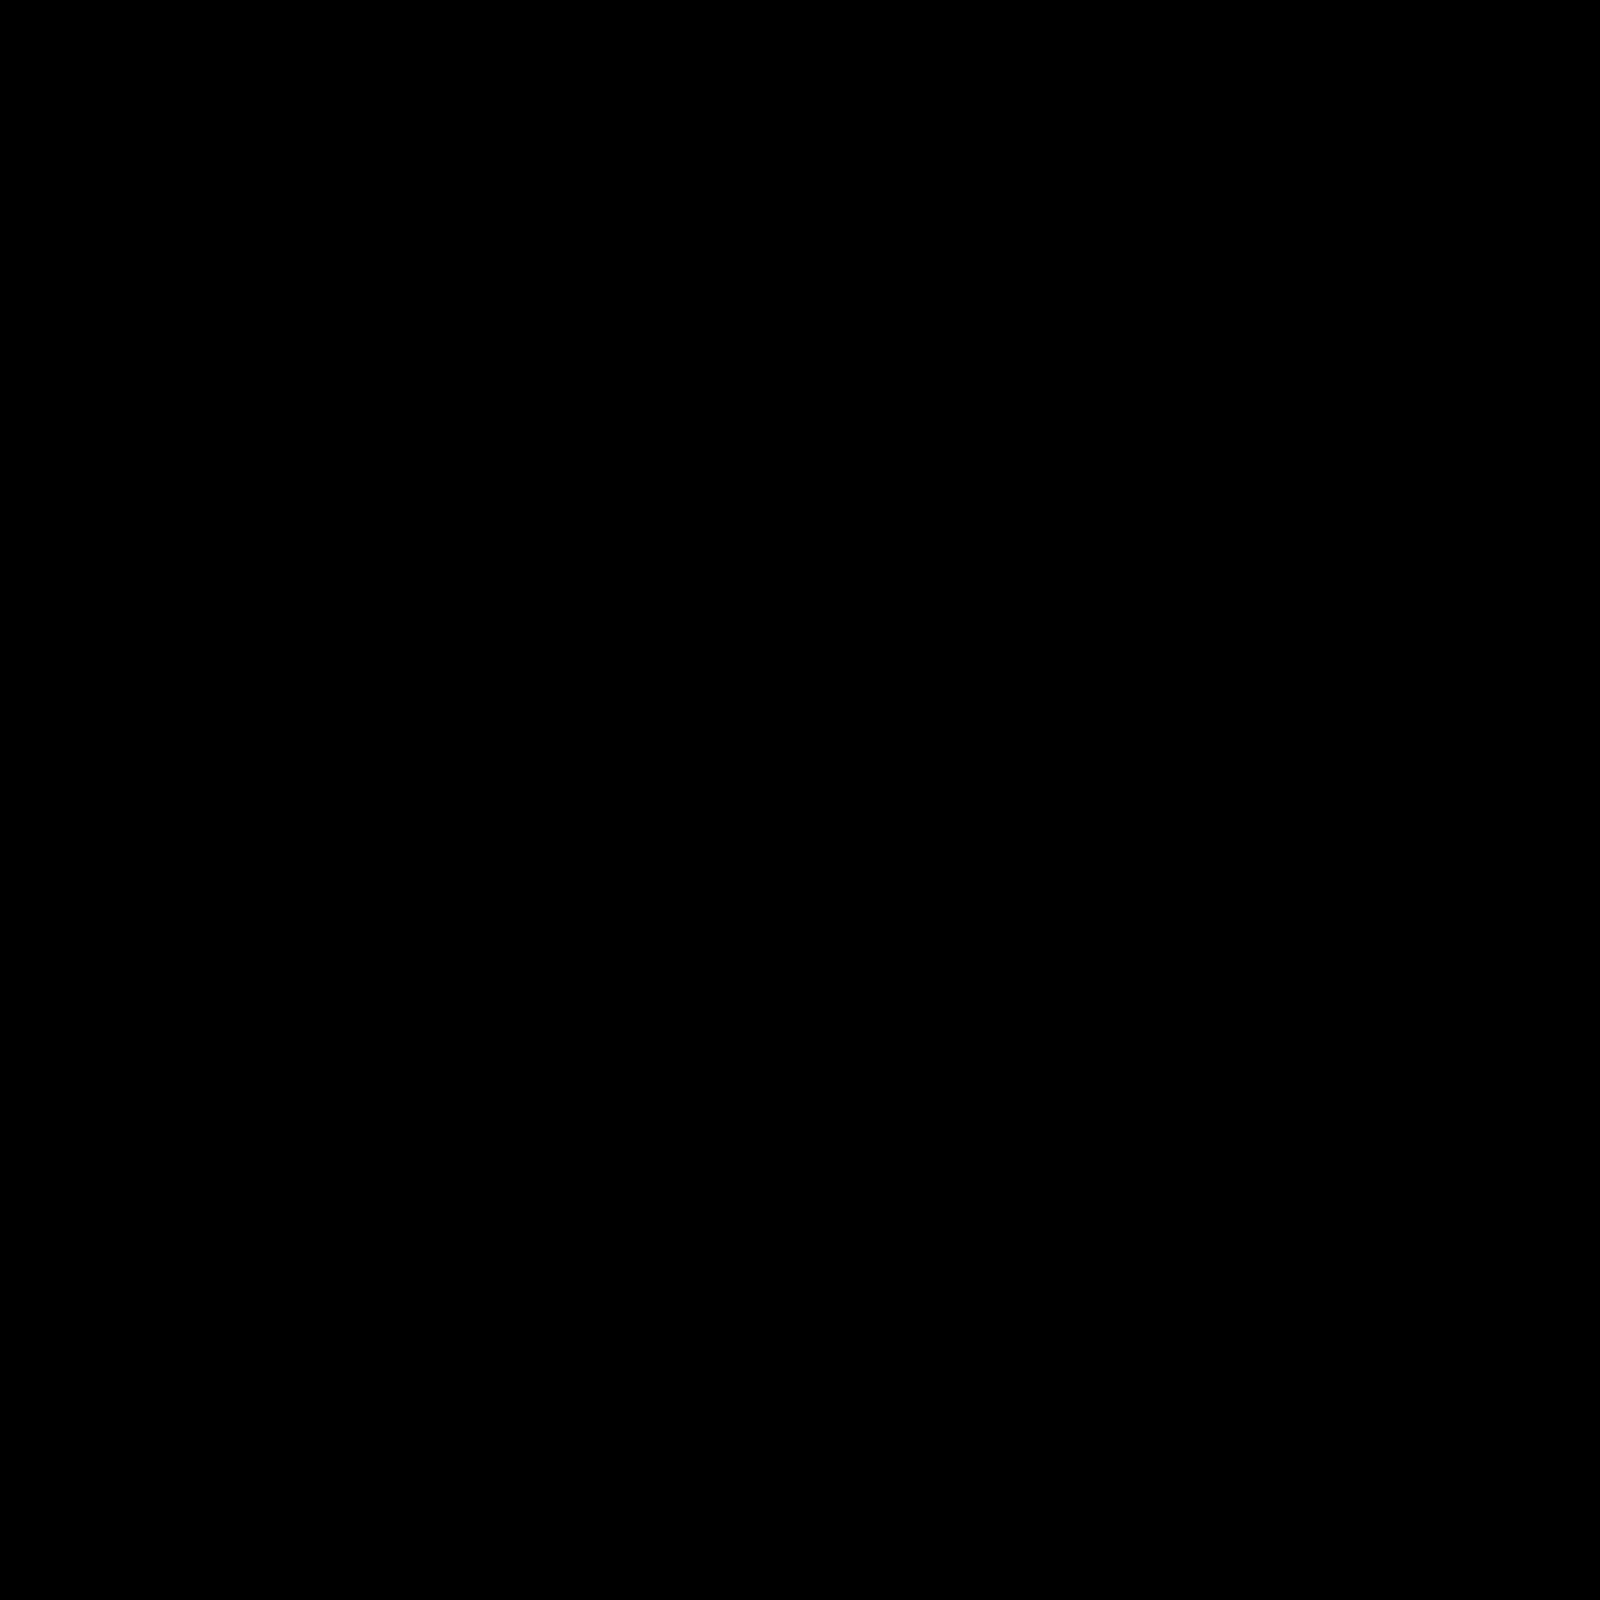 Niemcy Mapa icon